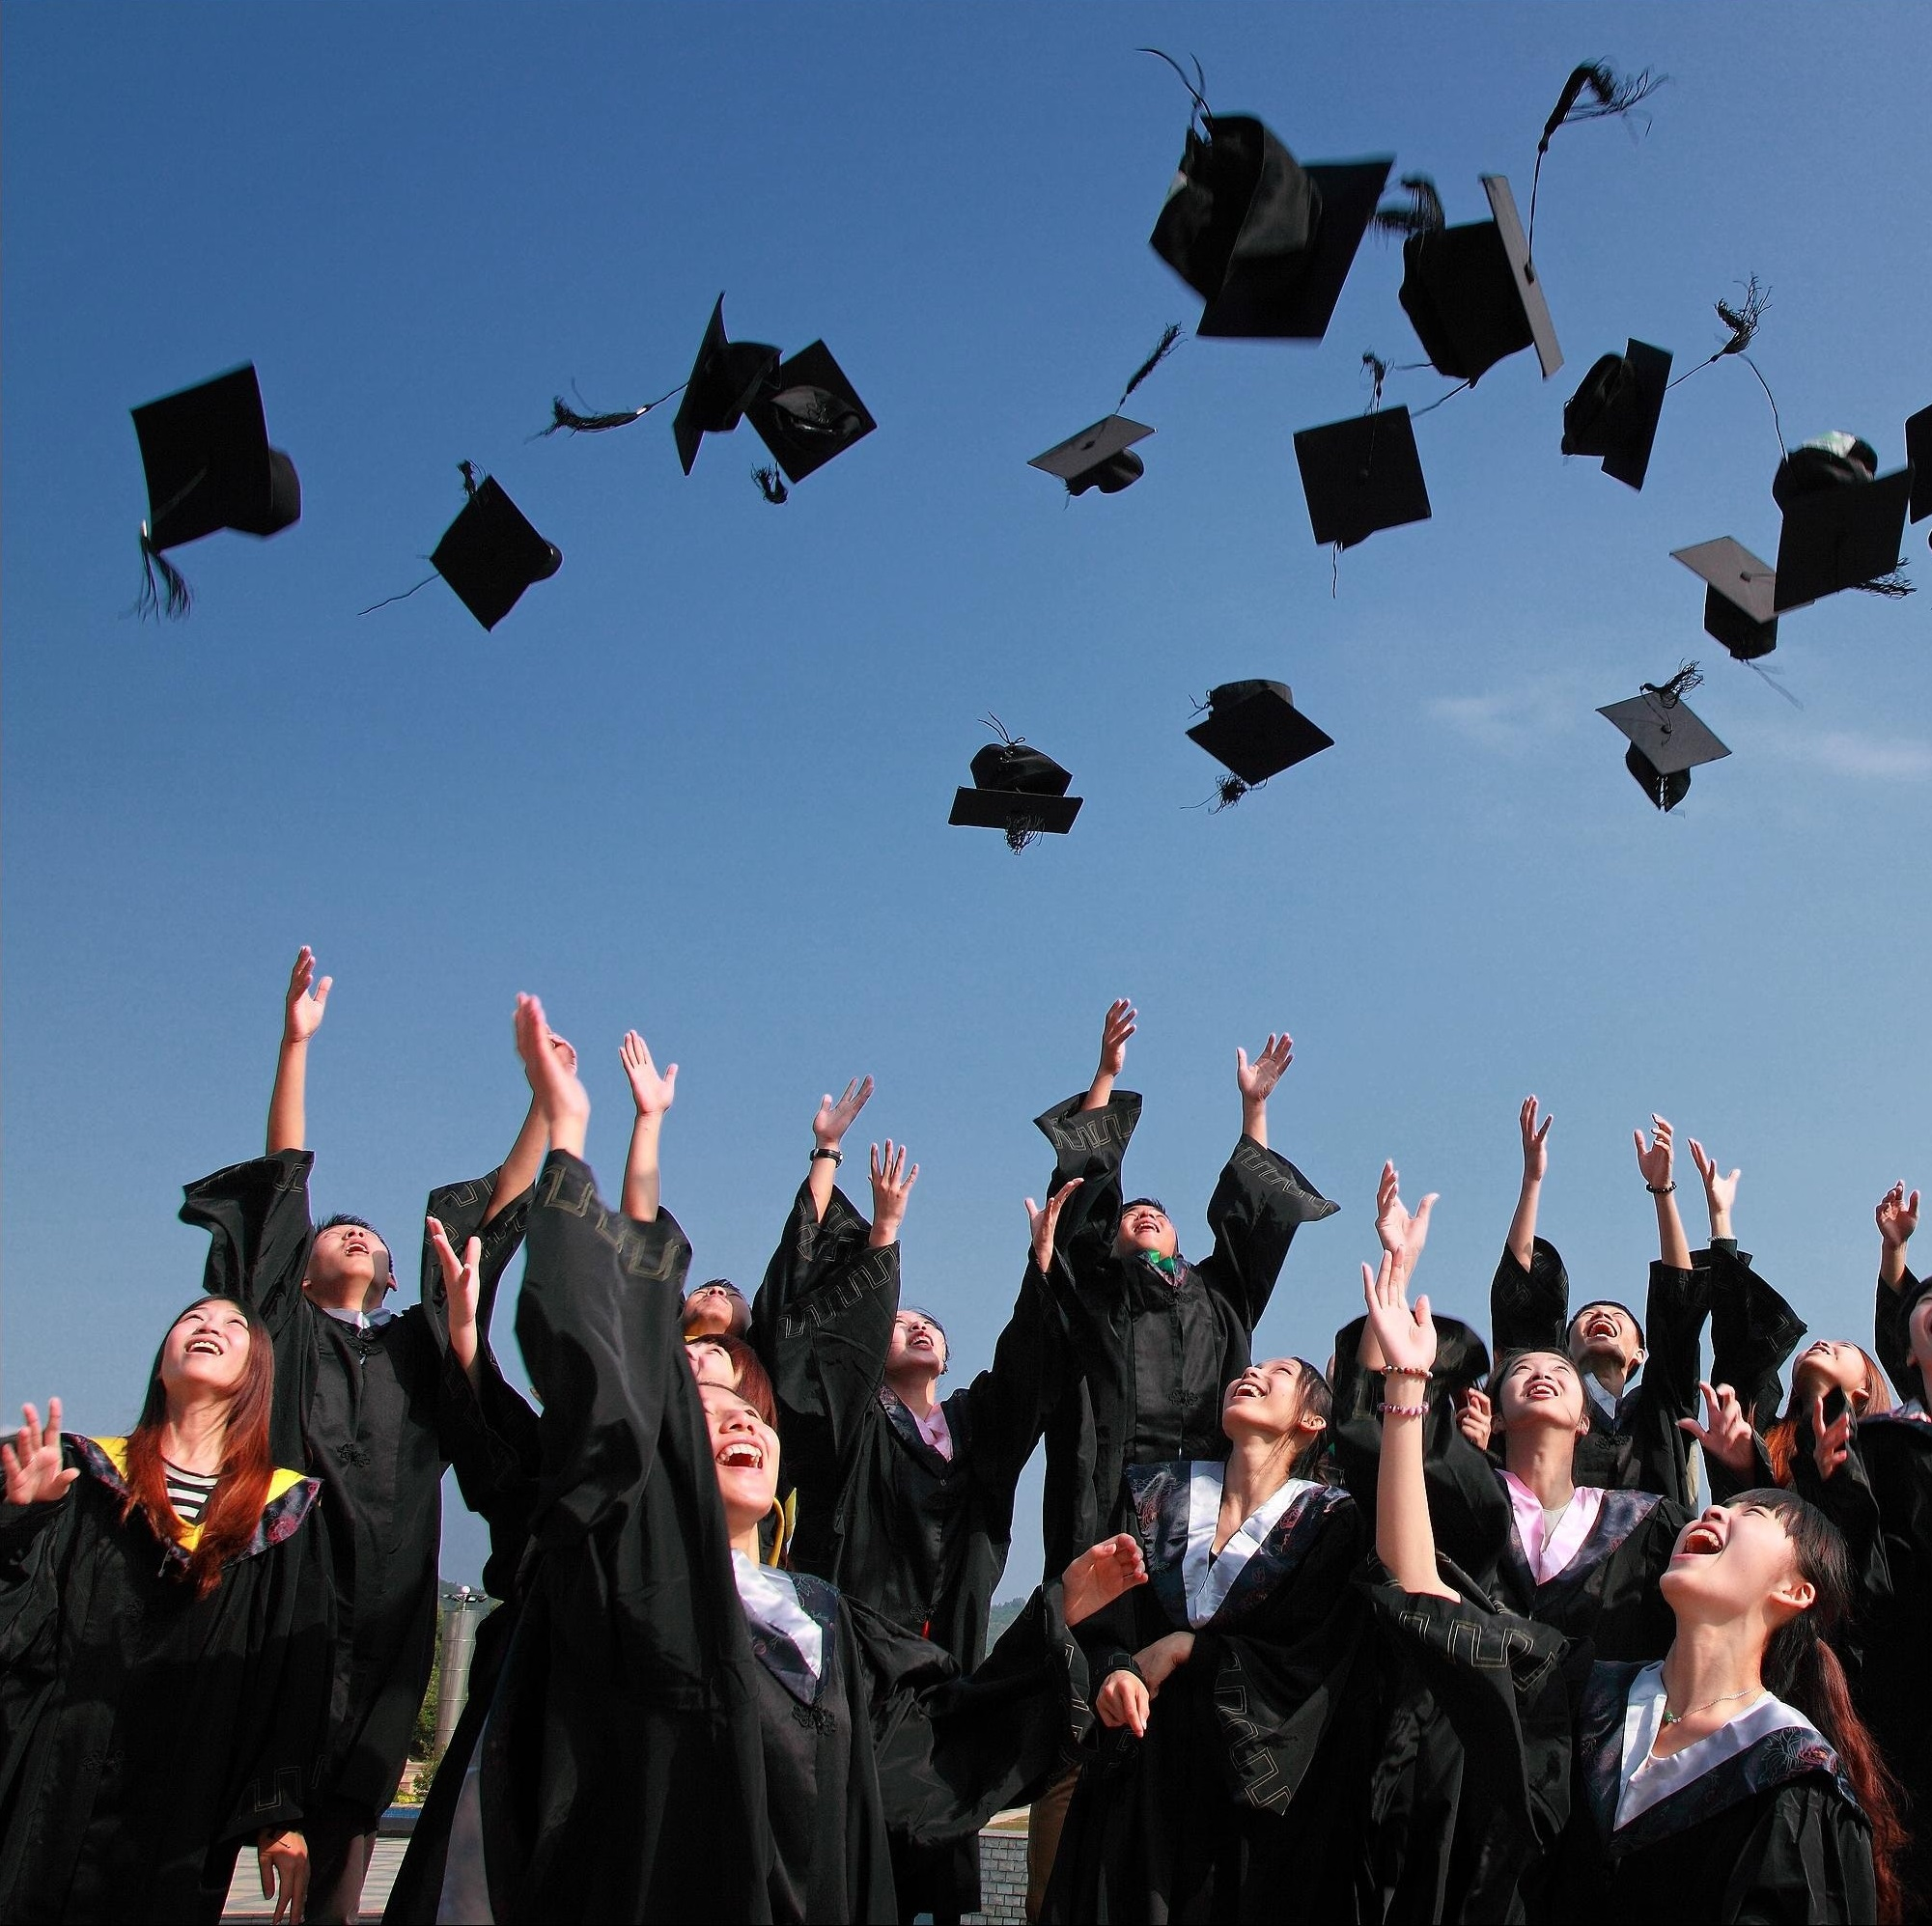 accomplishment-ceremony-college-2678851